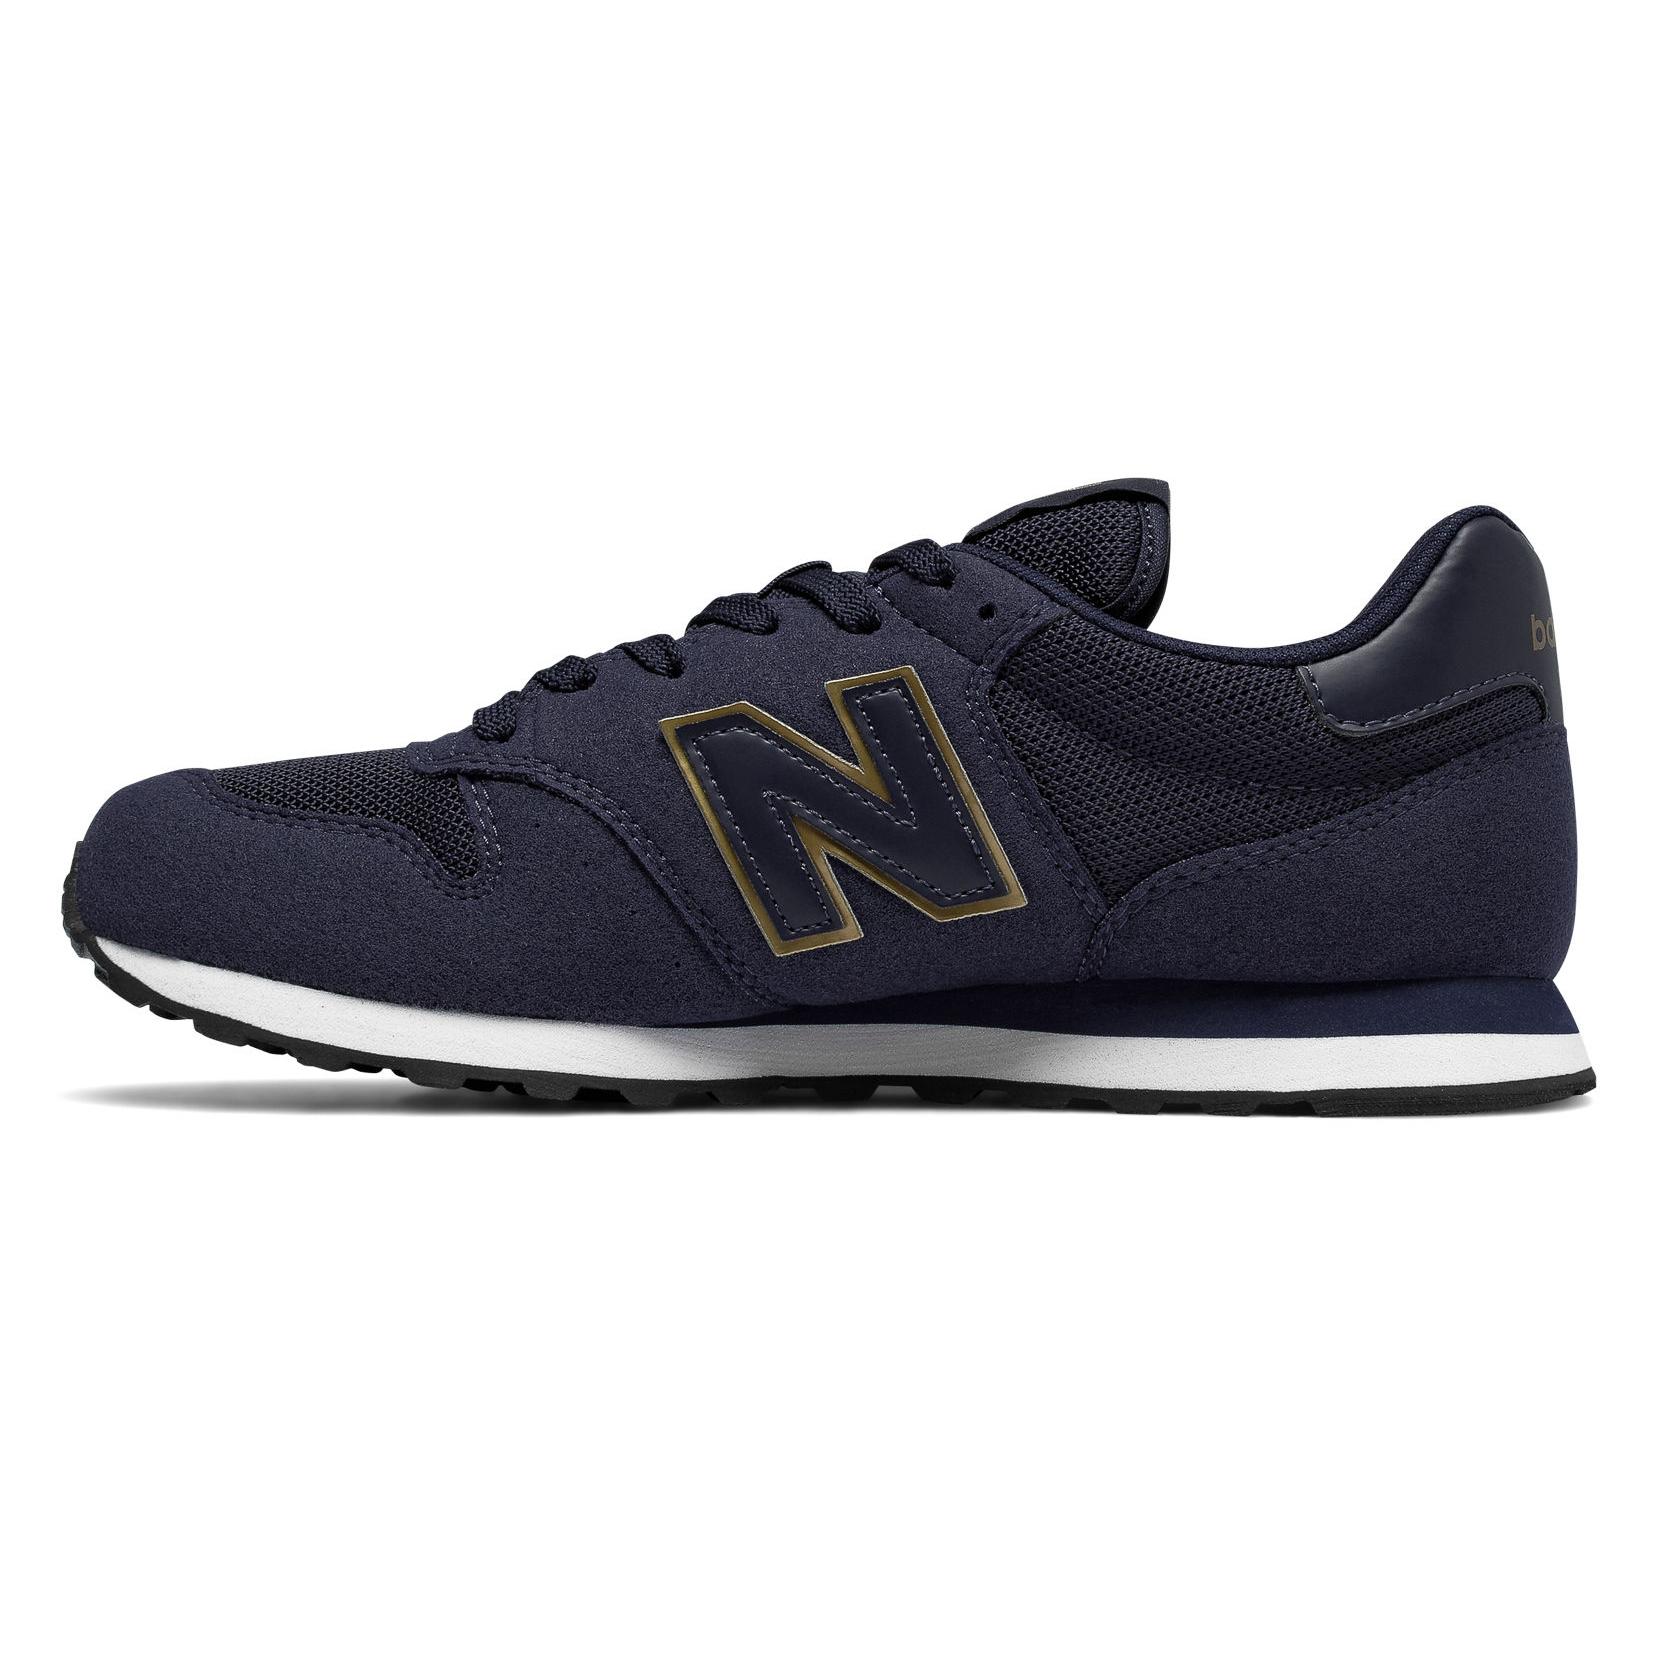 قیمت کفش راحتی مردانه نیو بالانس مدل GW500NGN